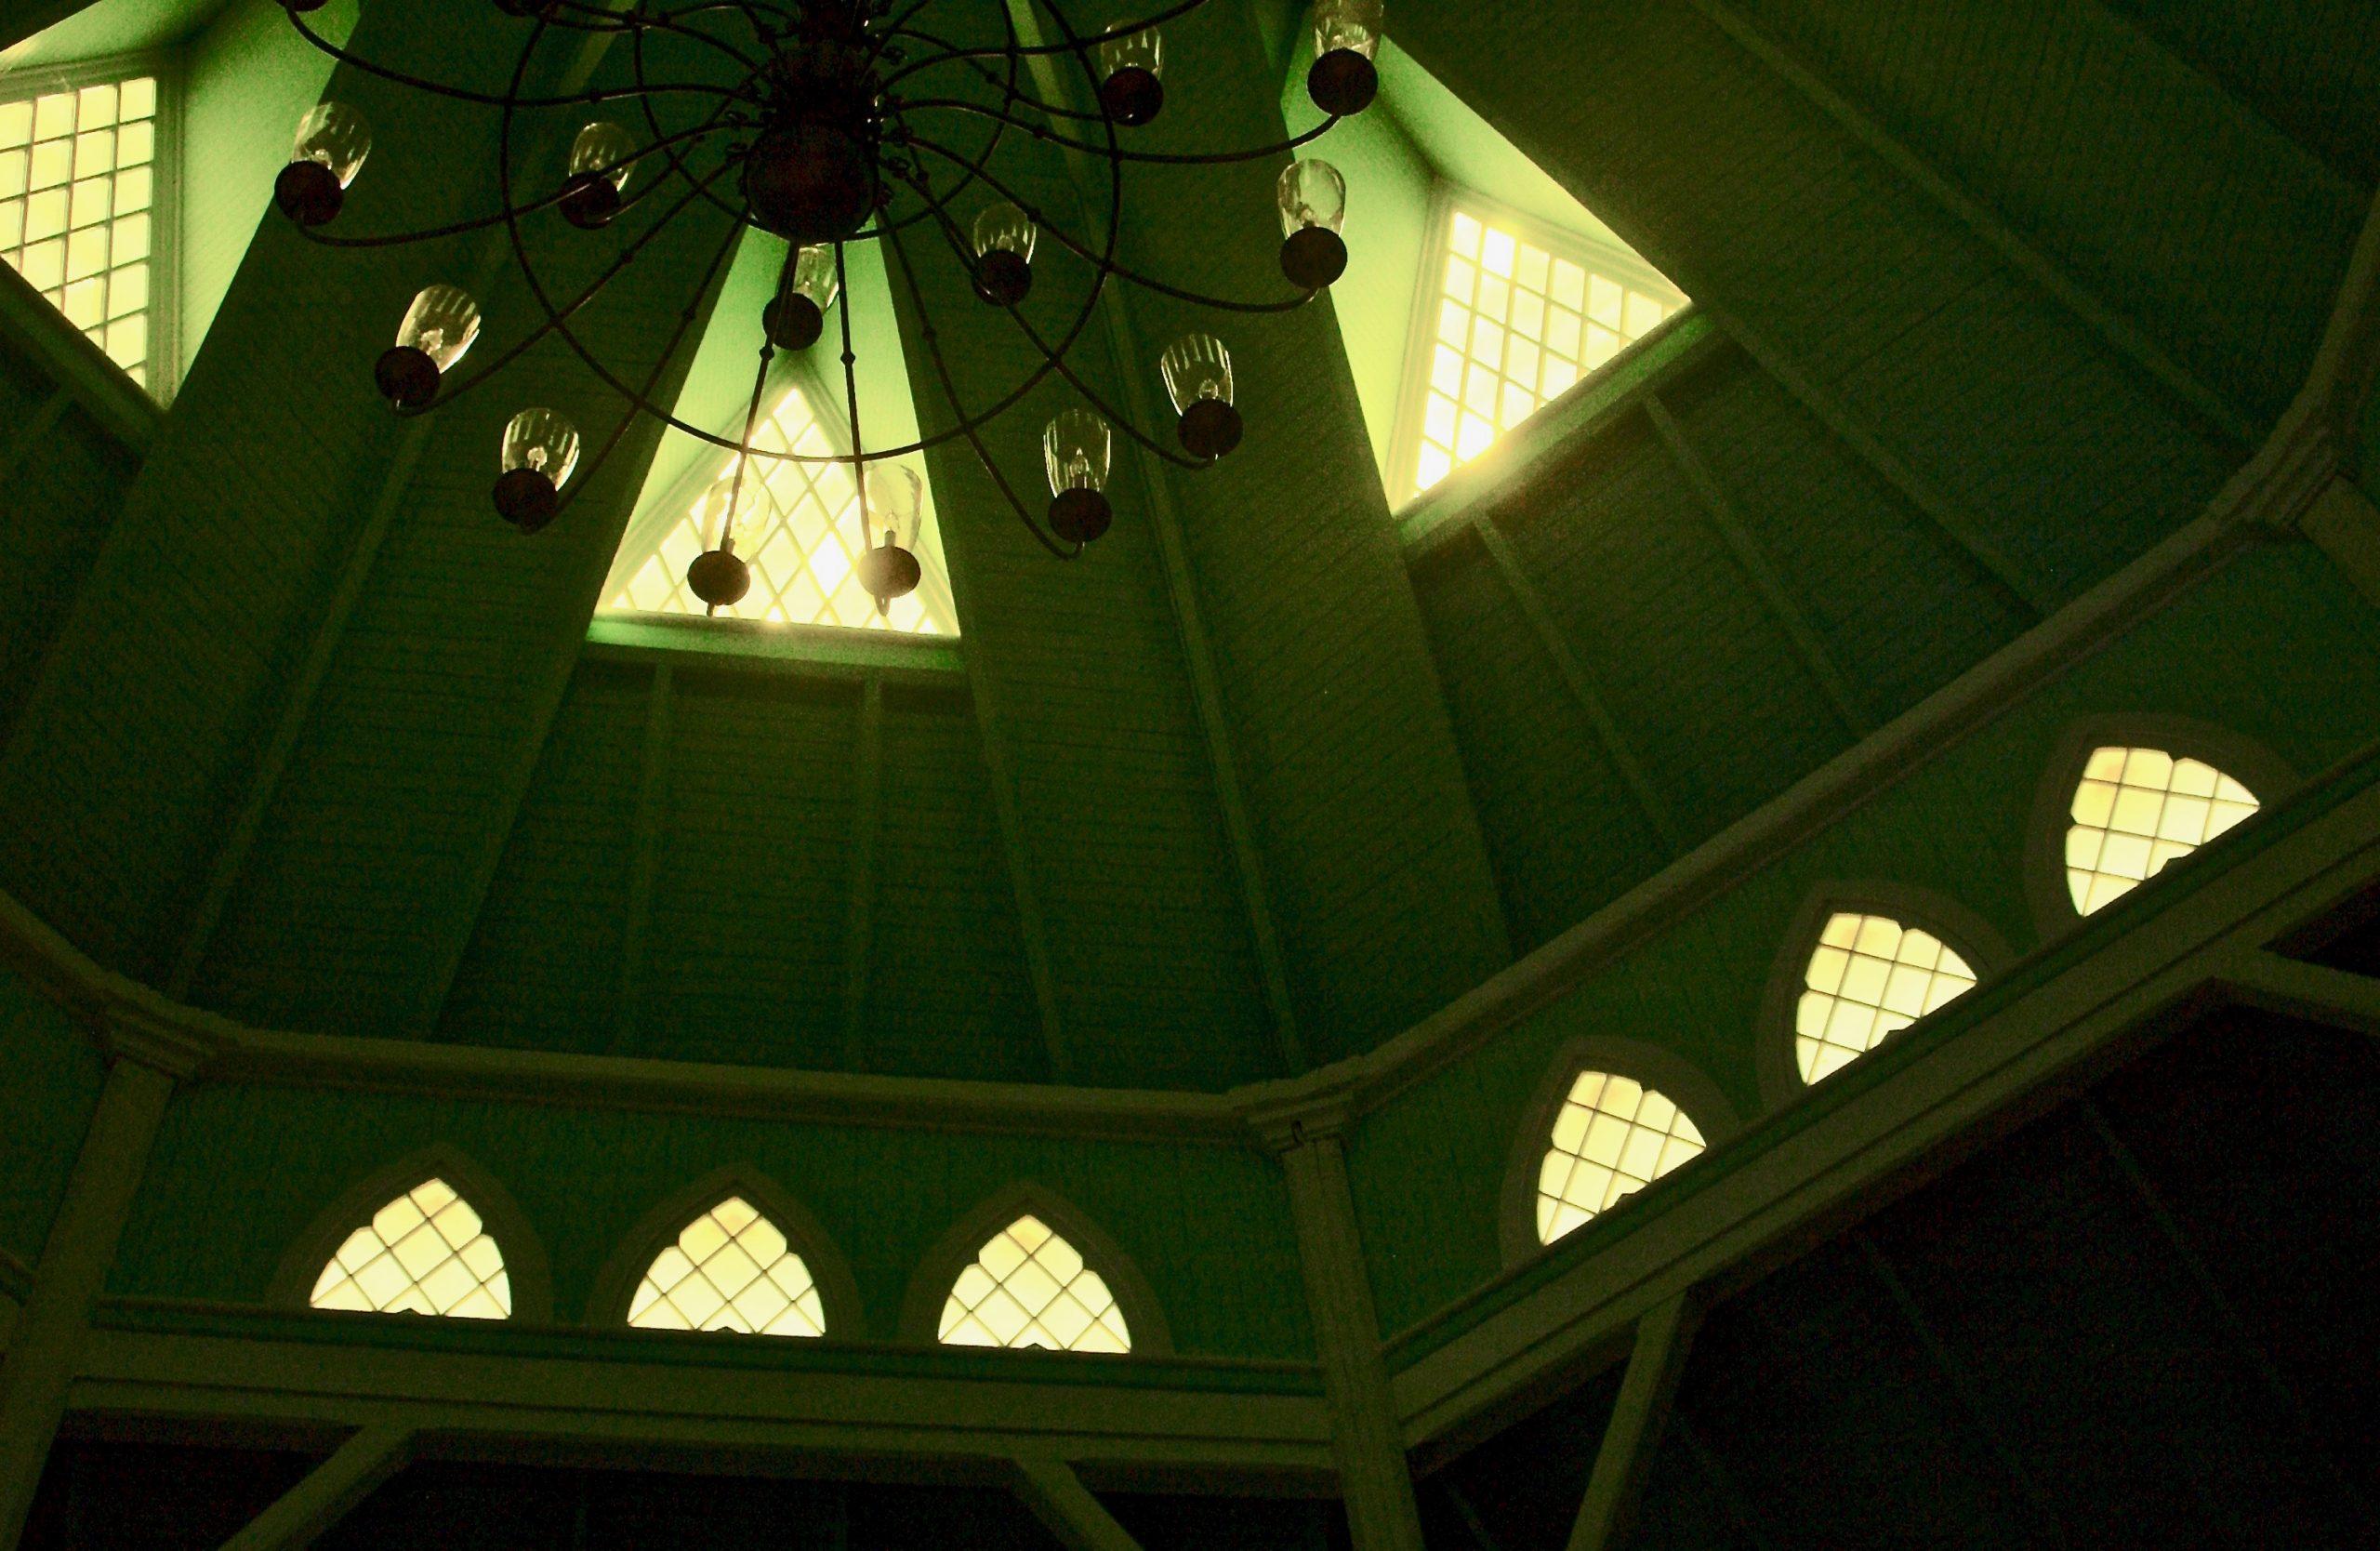 Where the Light Comes Streaming in; Union Chapel, Oak Bluffs, Martha's Vineyard, Massachusetts, USA